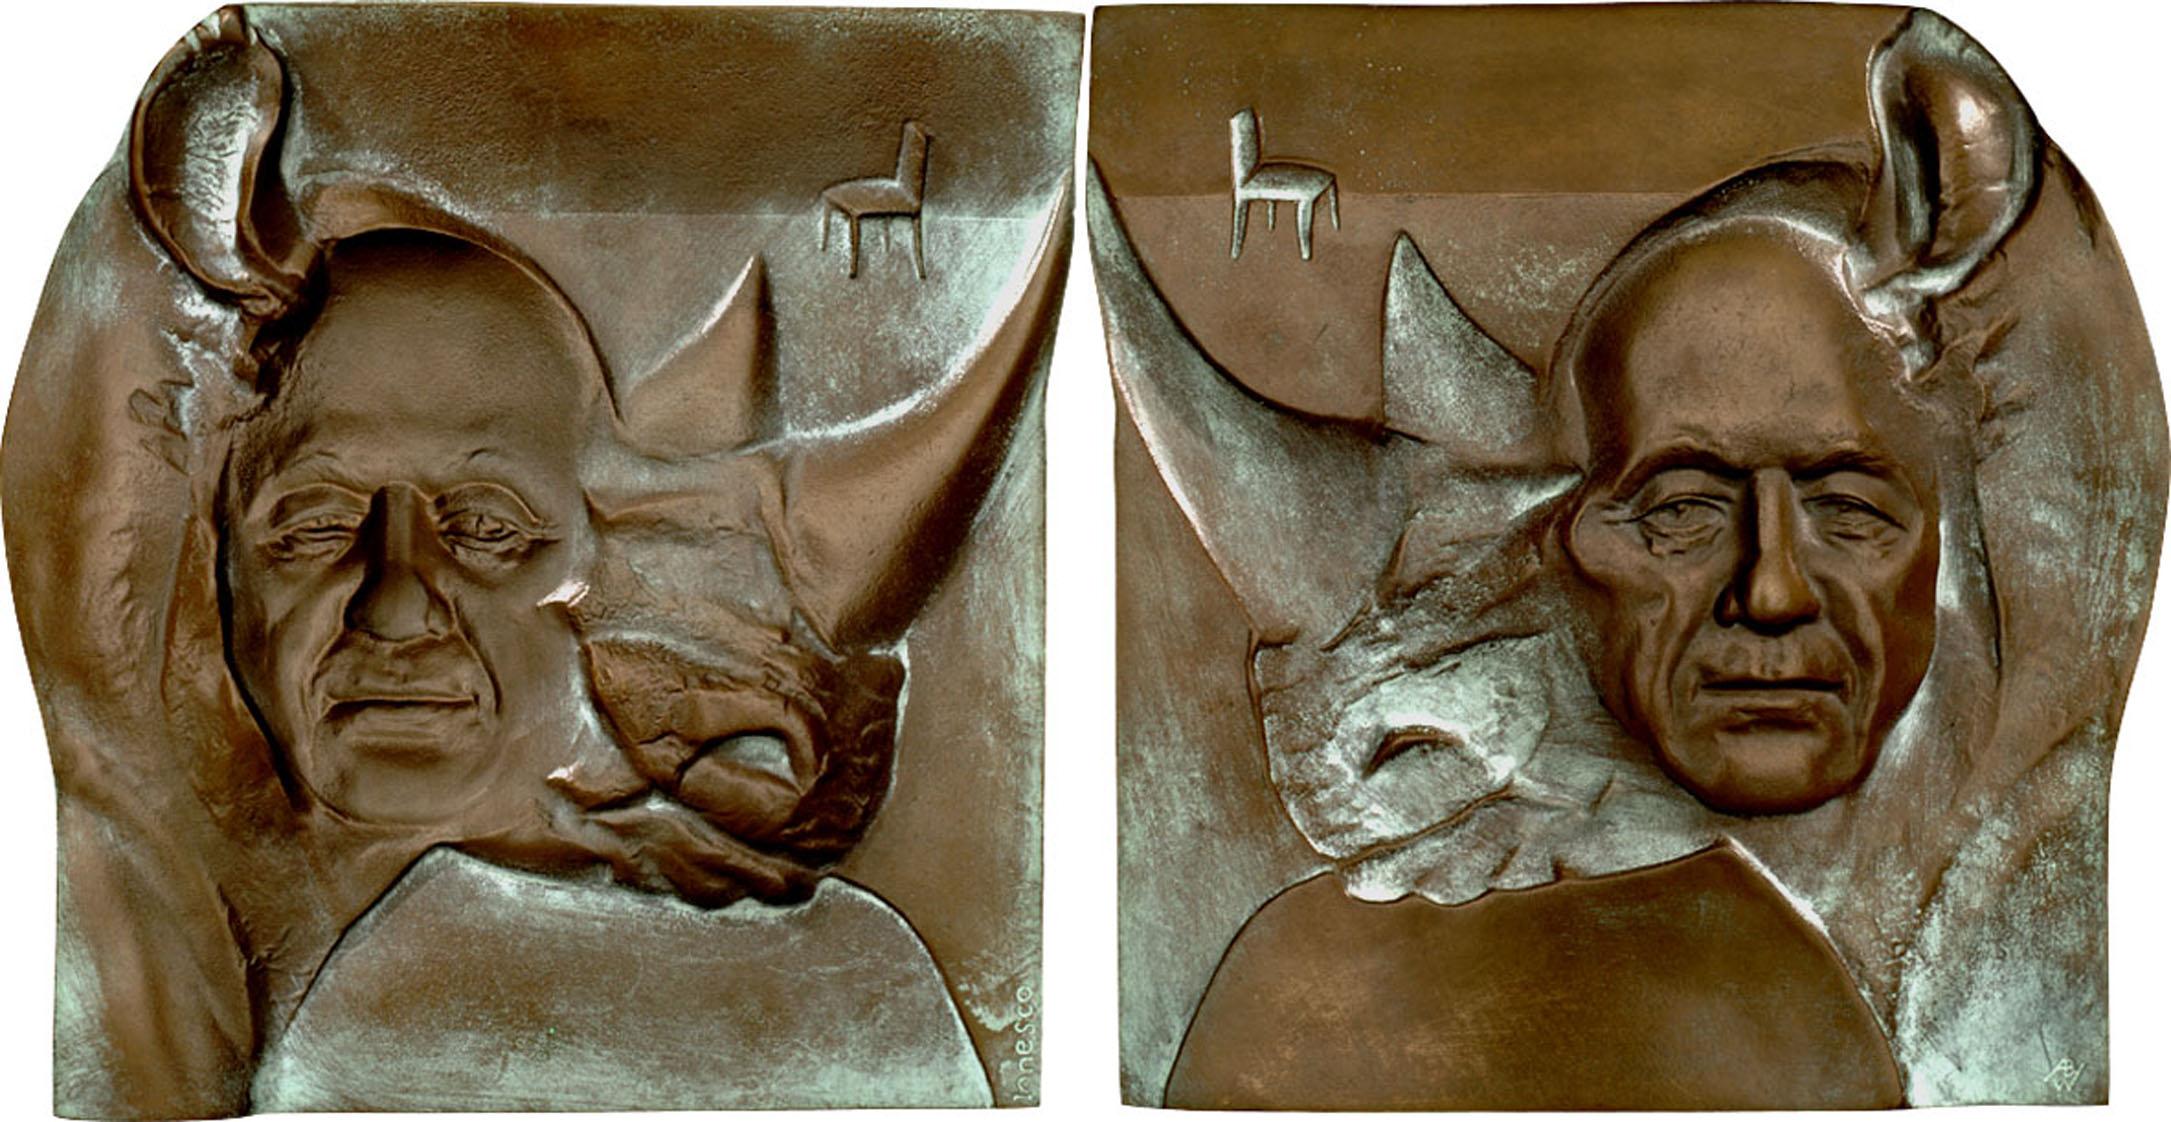 Eugene Ionesco 1998 (190x175mm)